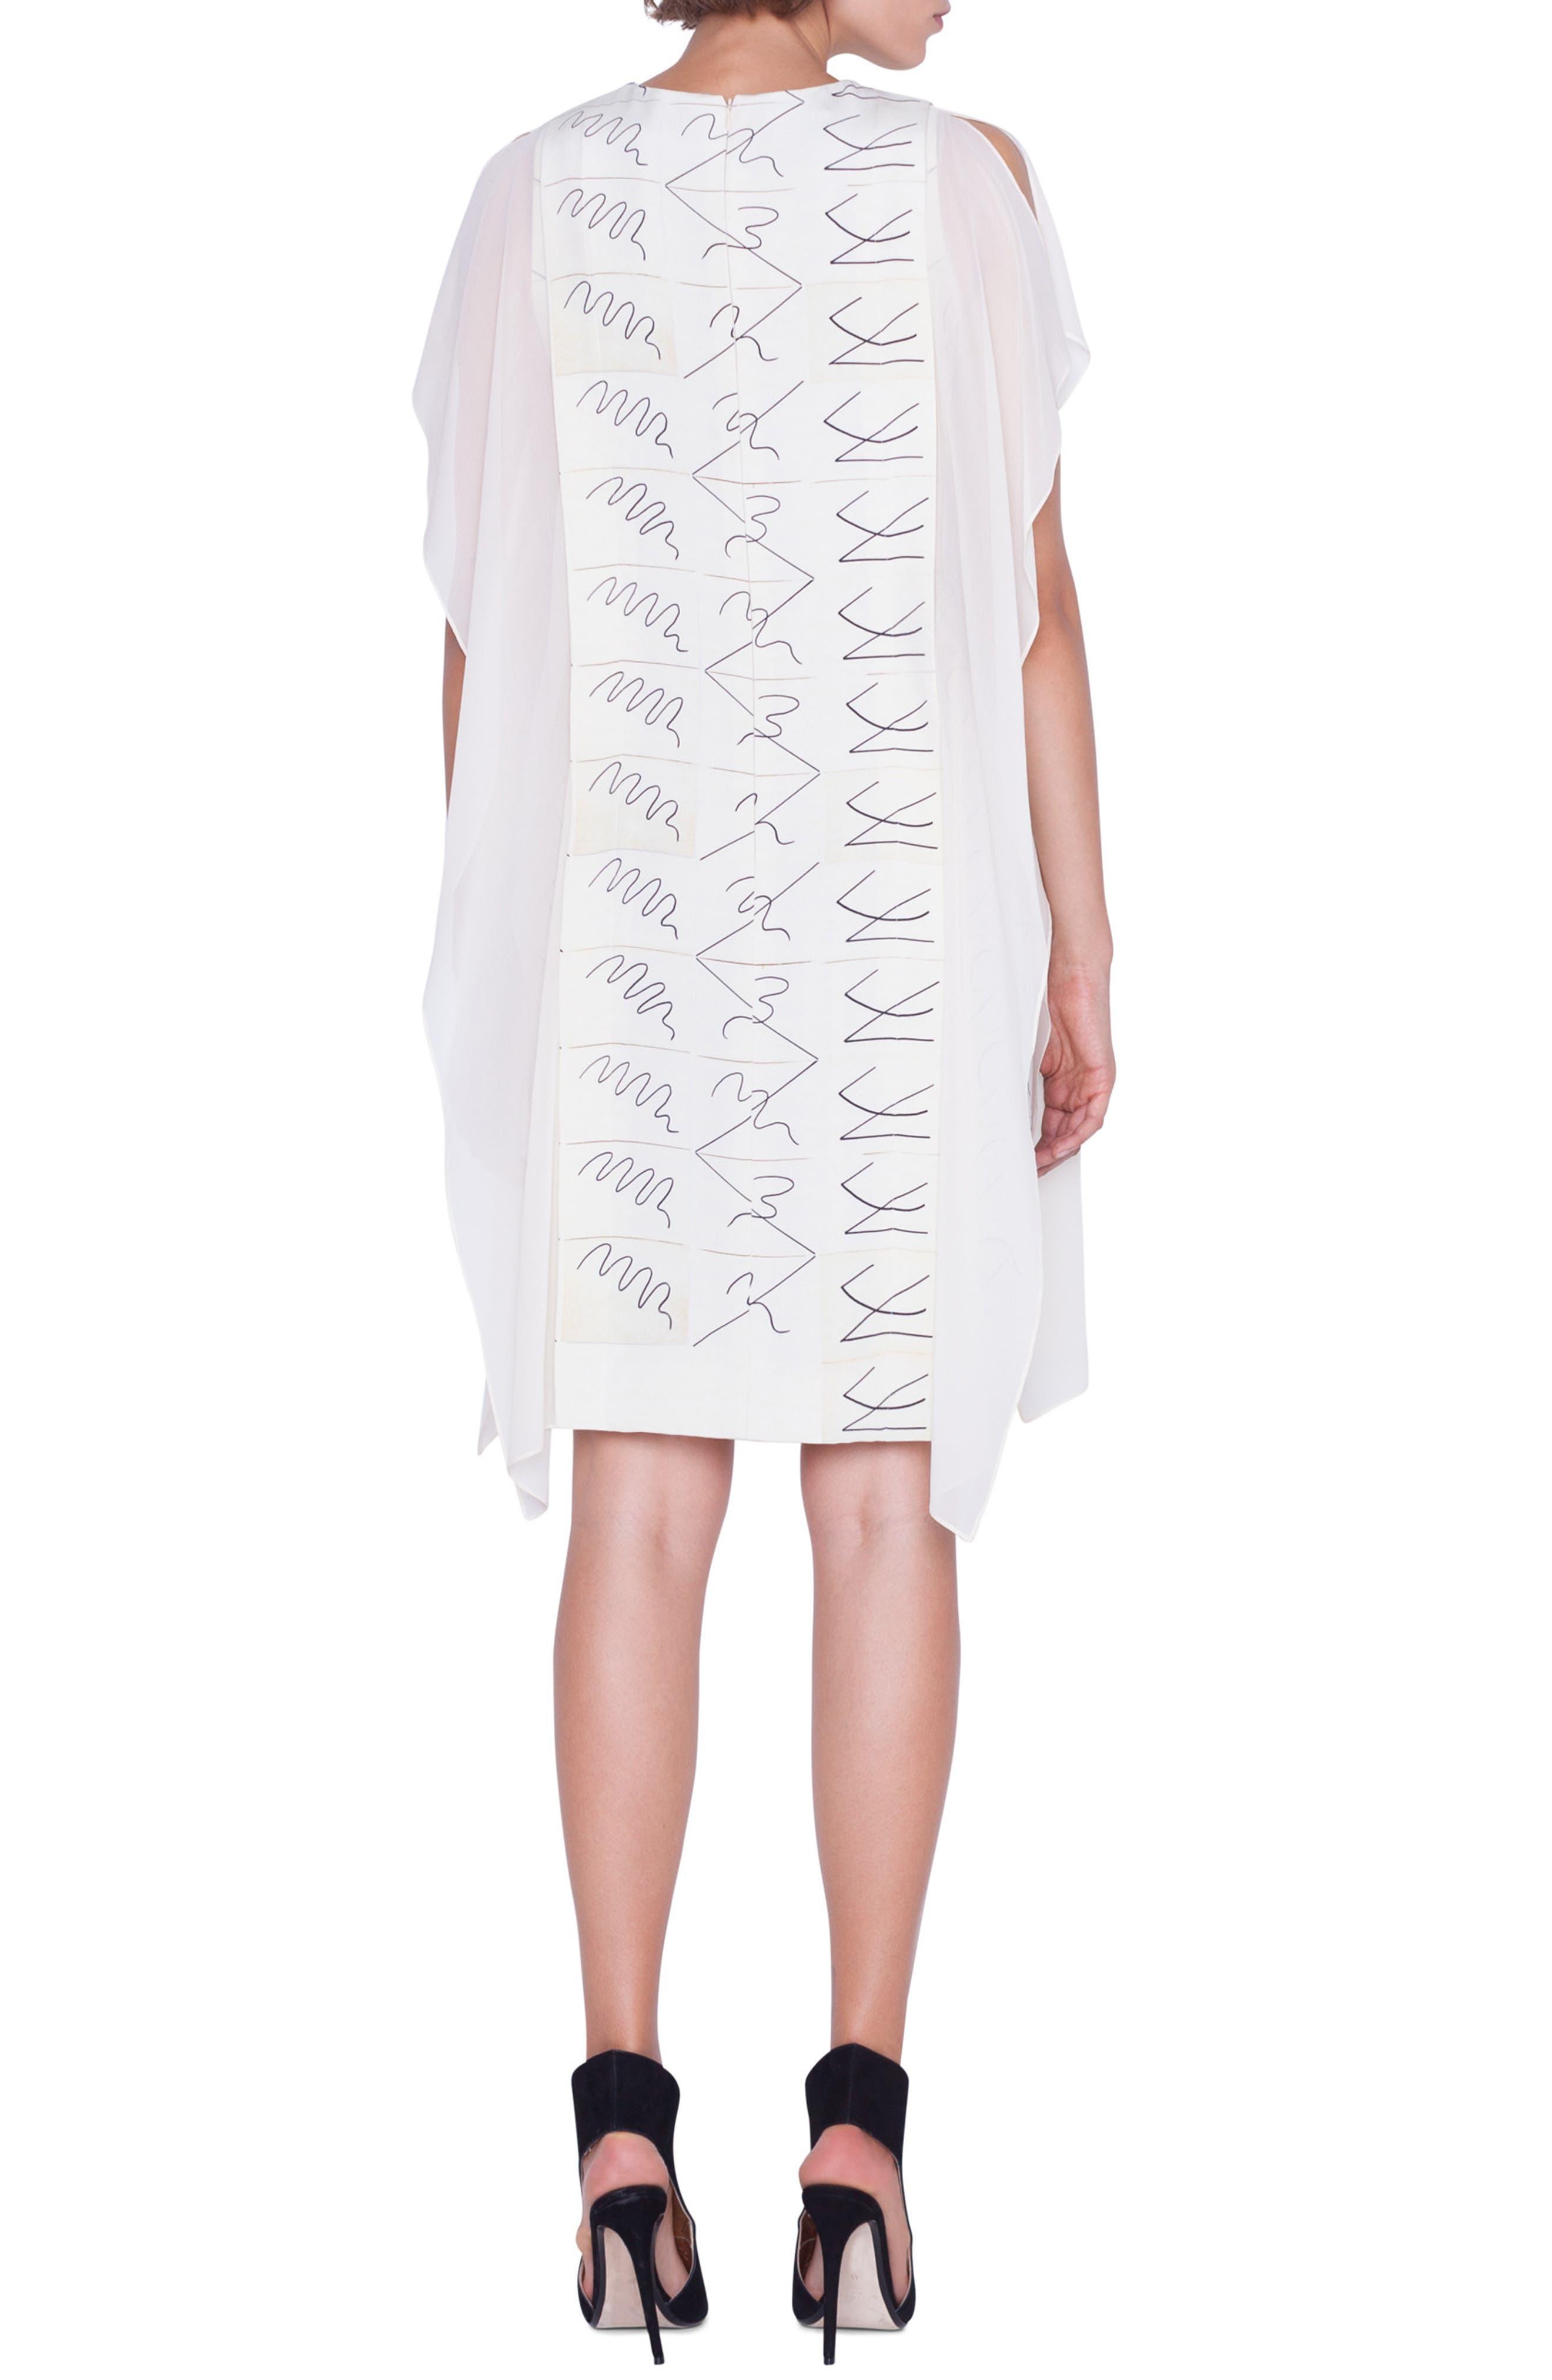 AKRIS, Leporello Print Cold Shoulder Silk Dress, Alternate thumbnail 2, color, PAPER